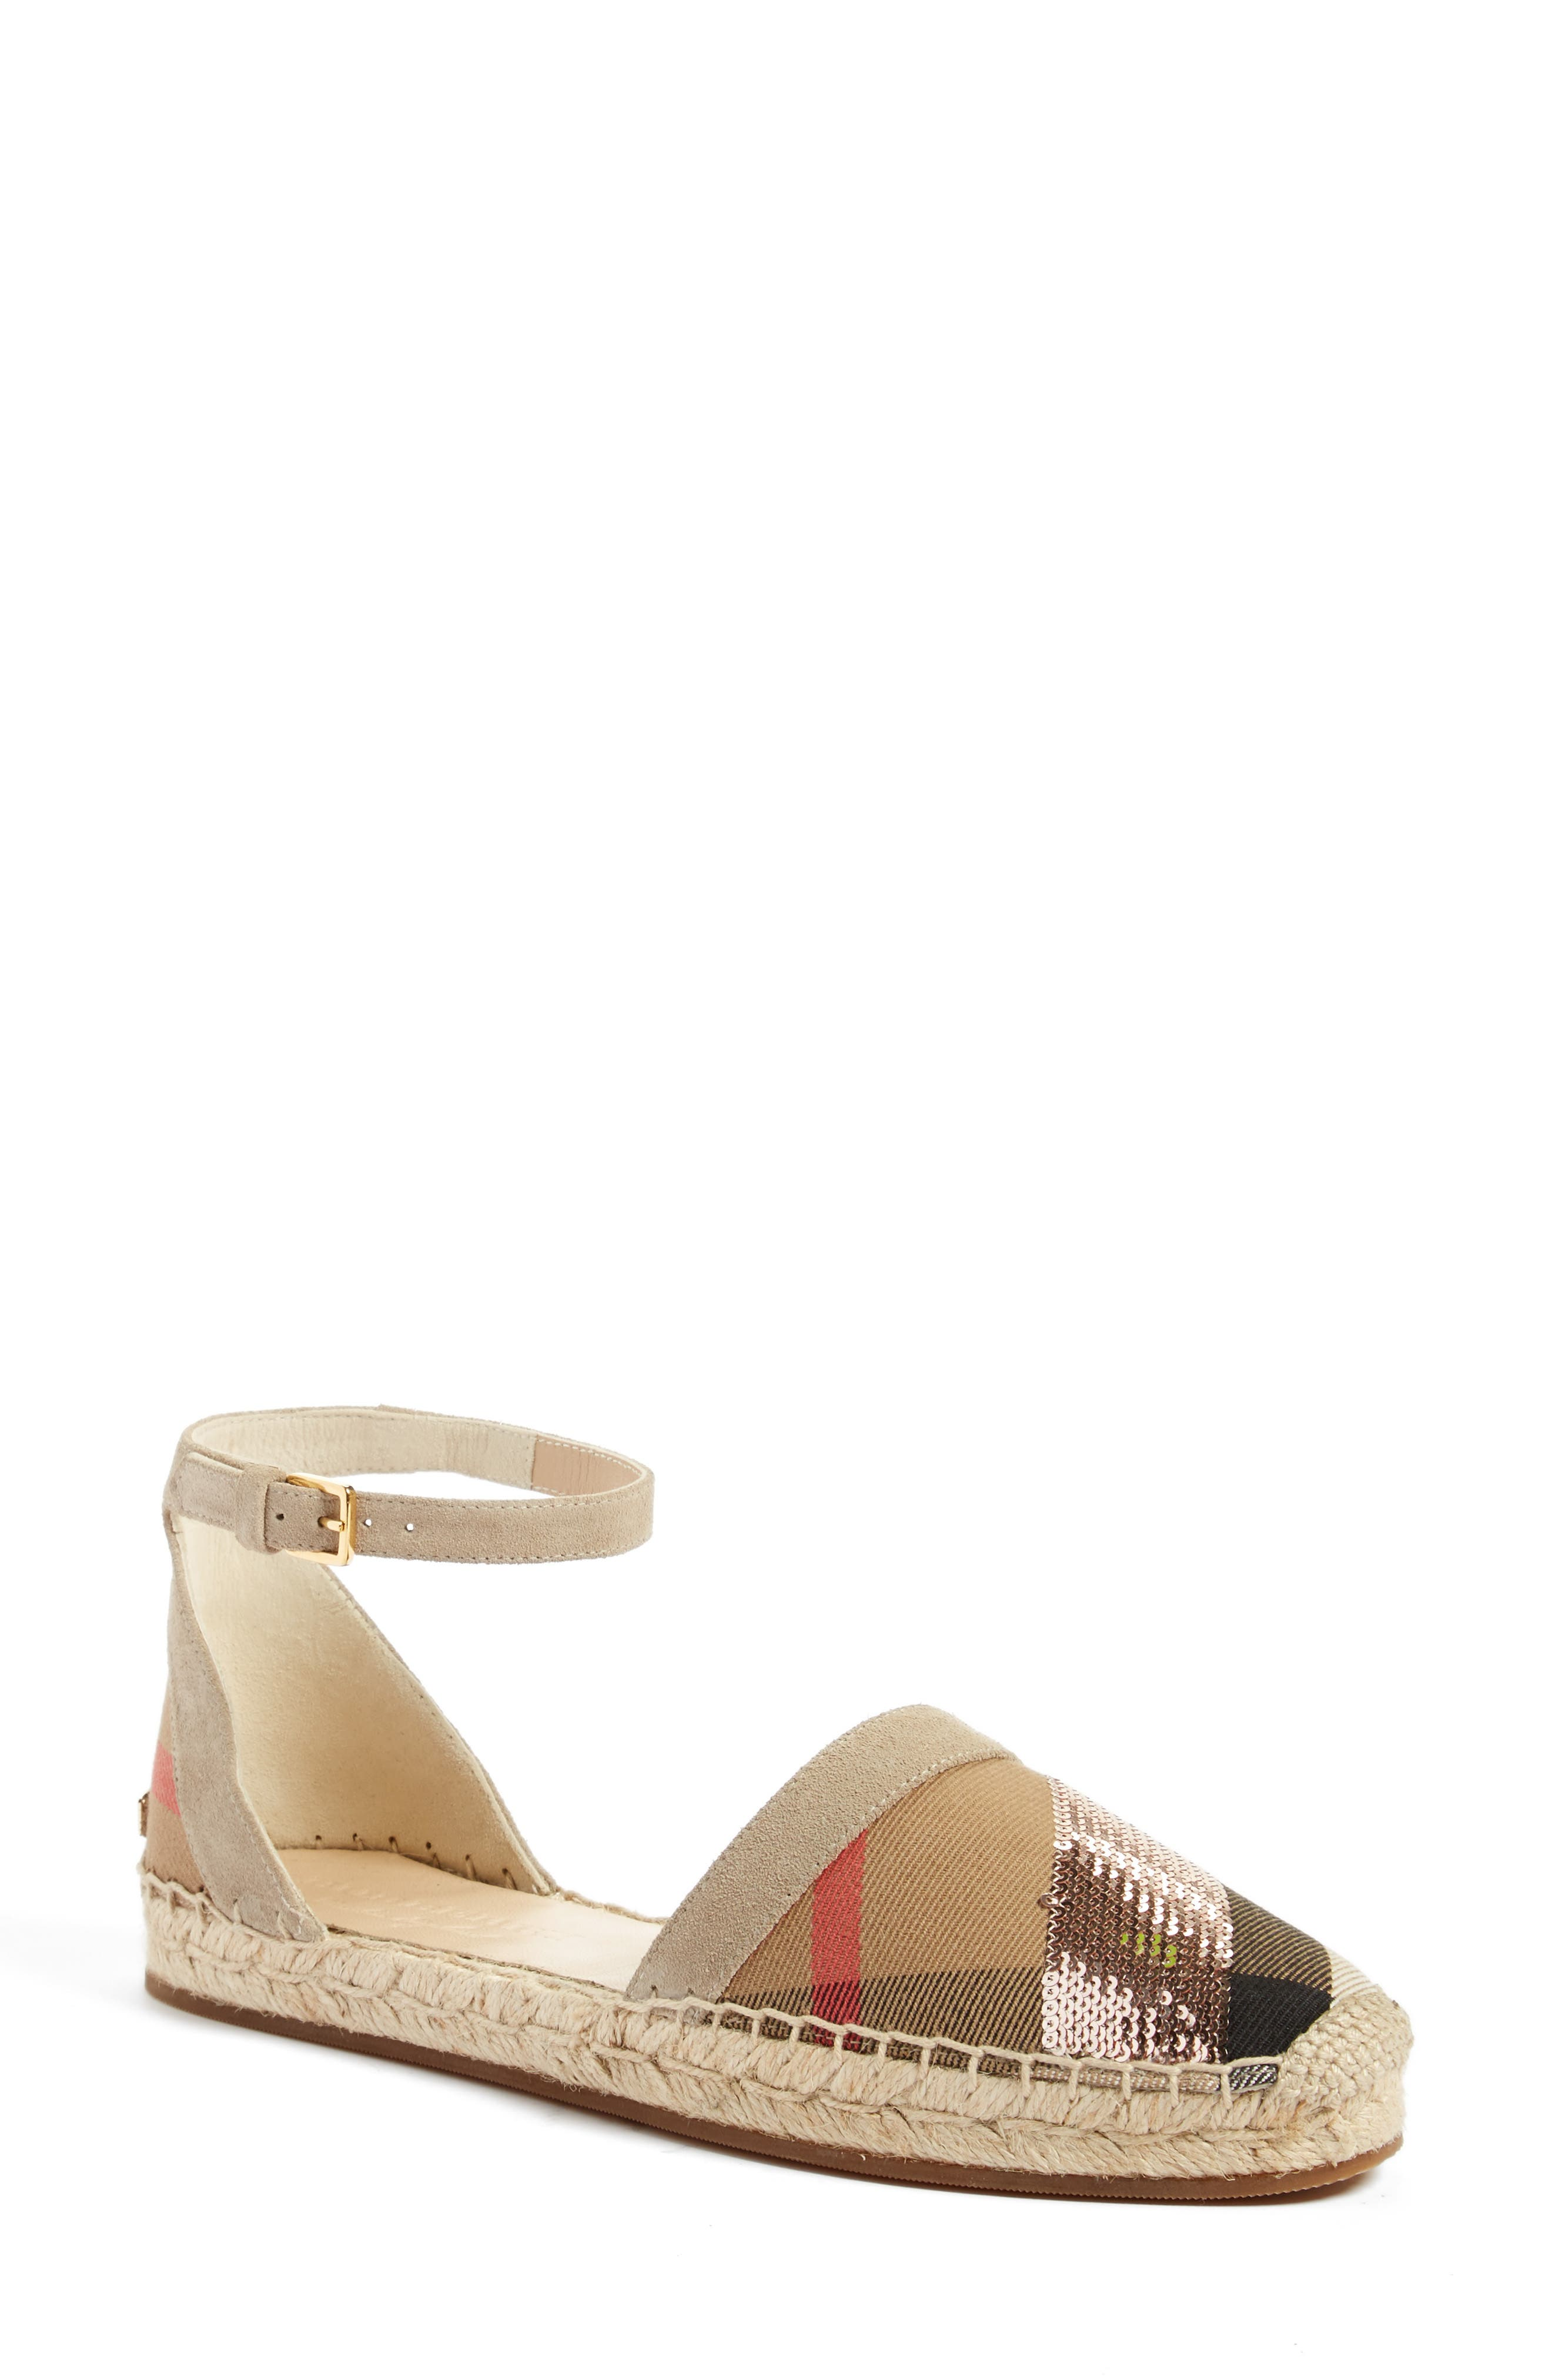 'Abbingdon' Ankle Strap Espadrille Sandal,                             Alternate thumbnail 9, color,